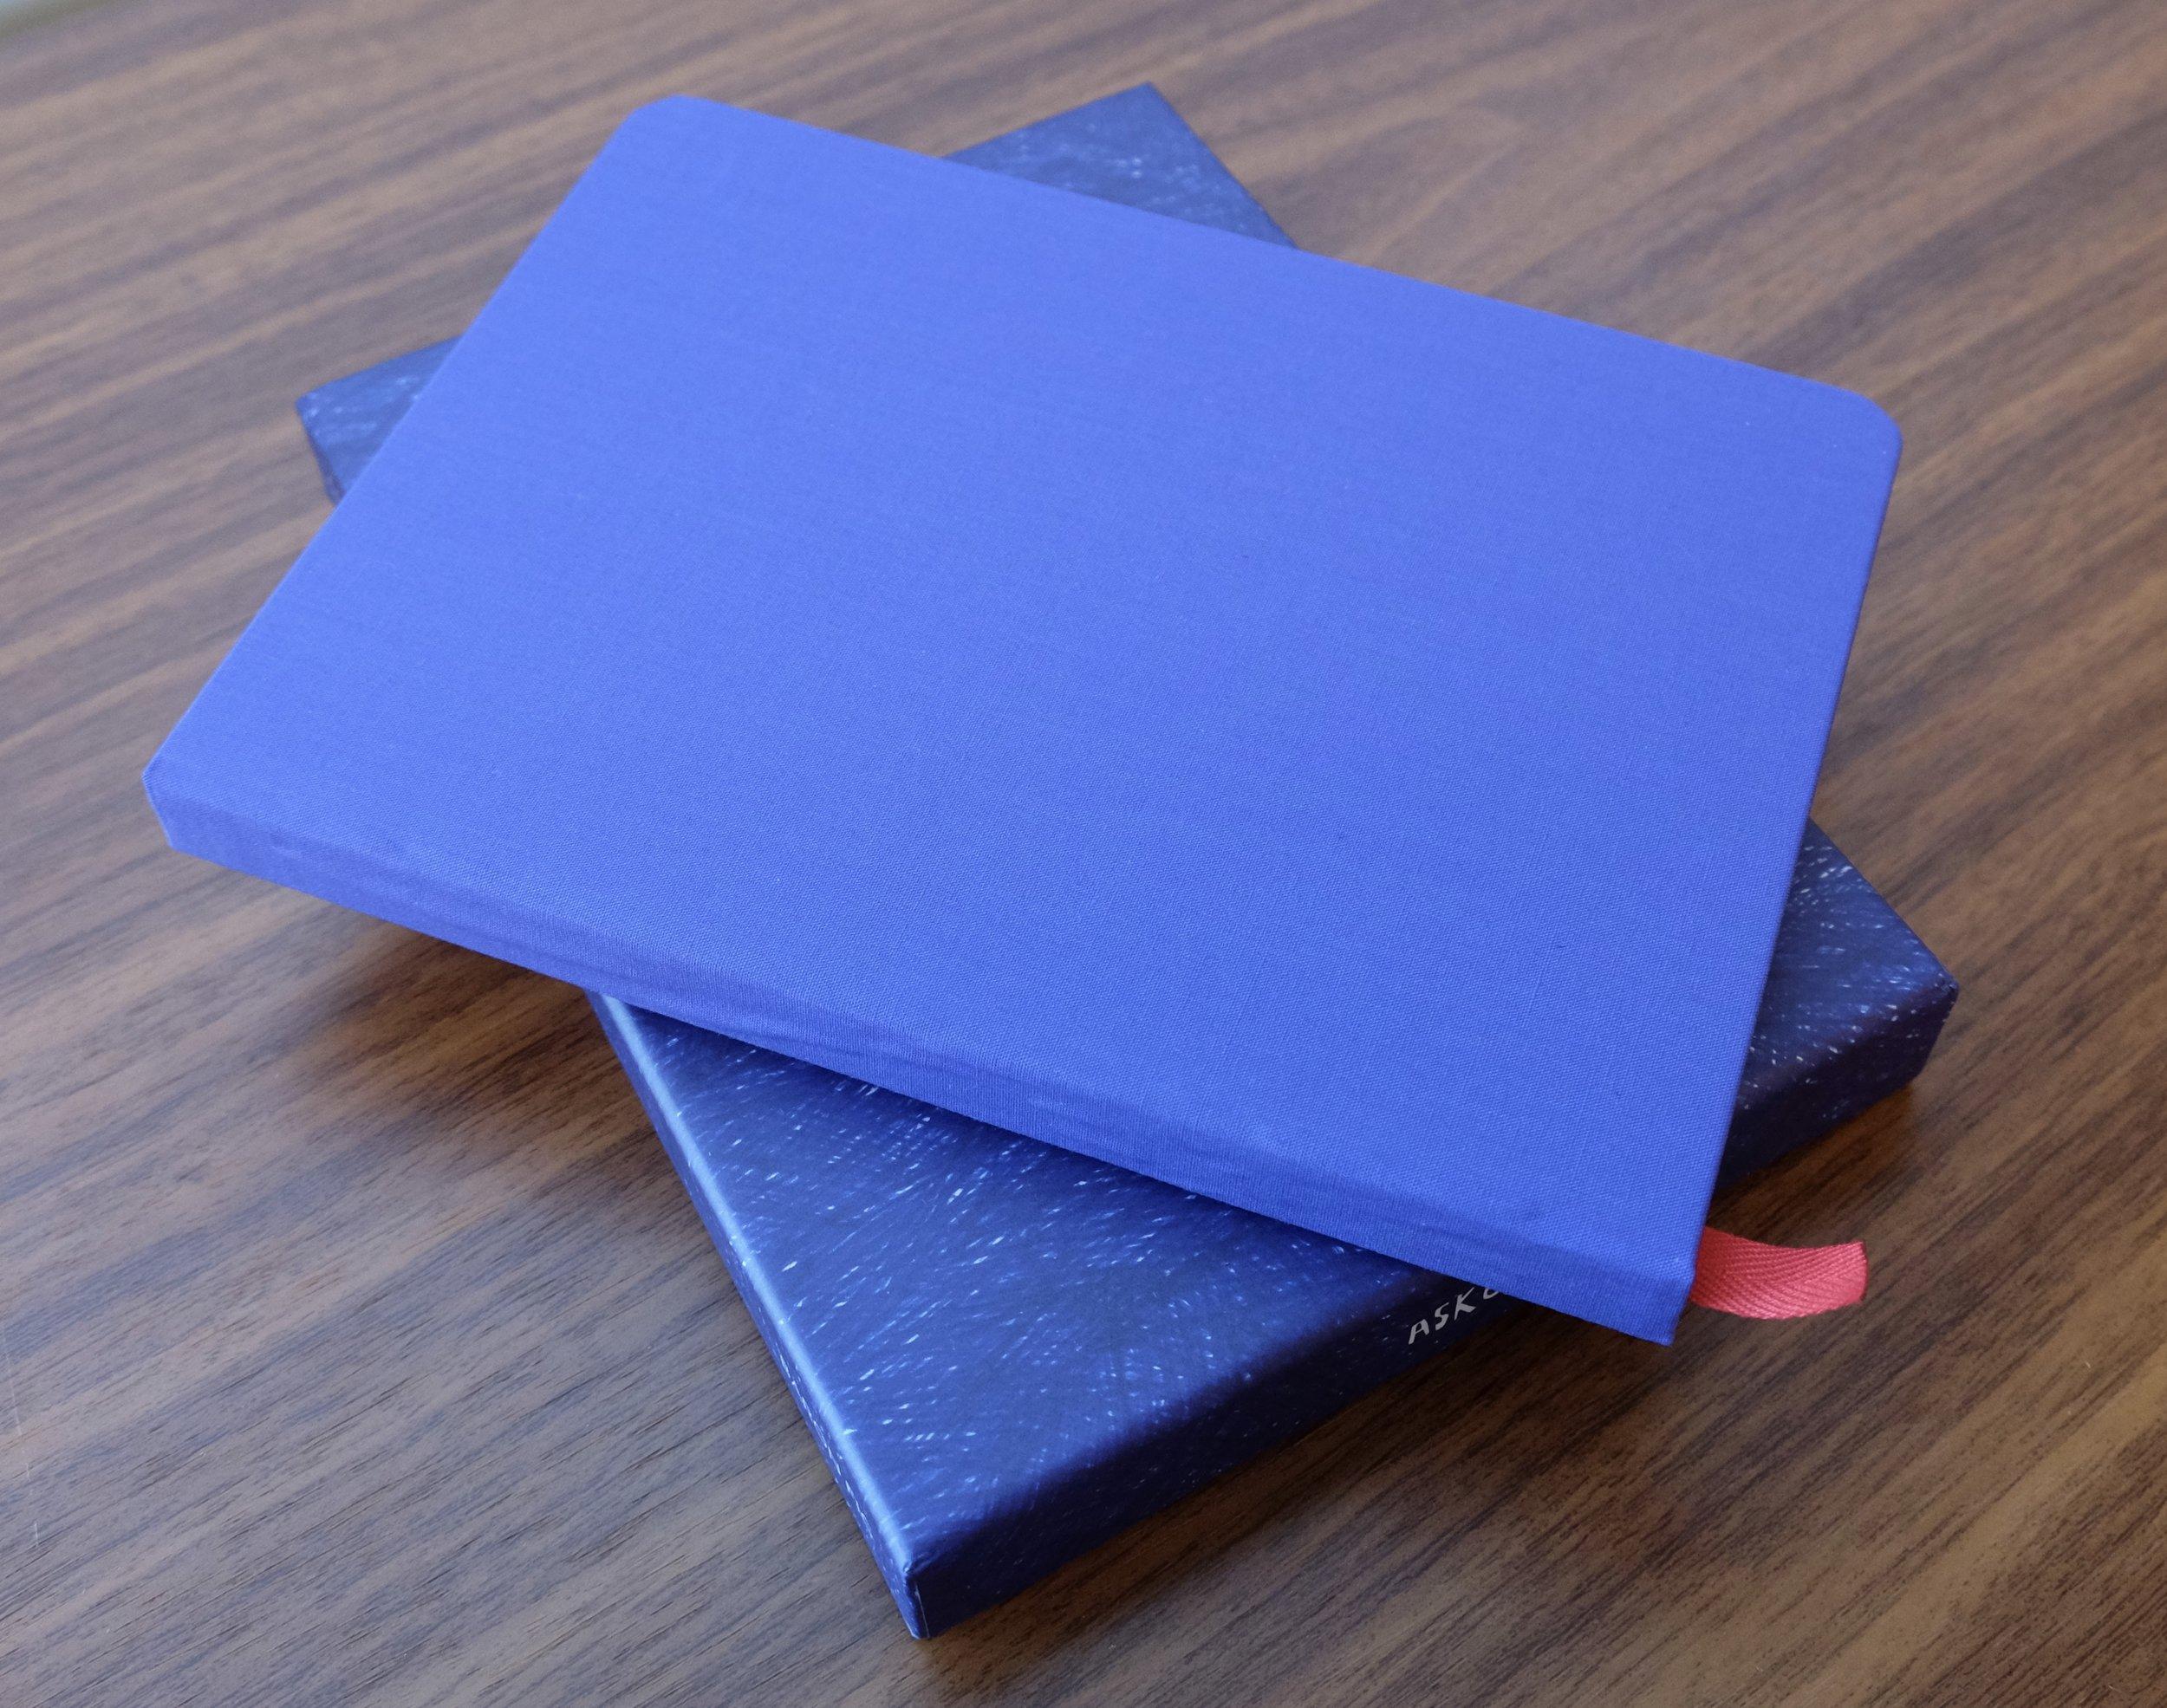 Baron Fig Askew: Blue Cover Confidant